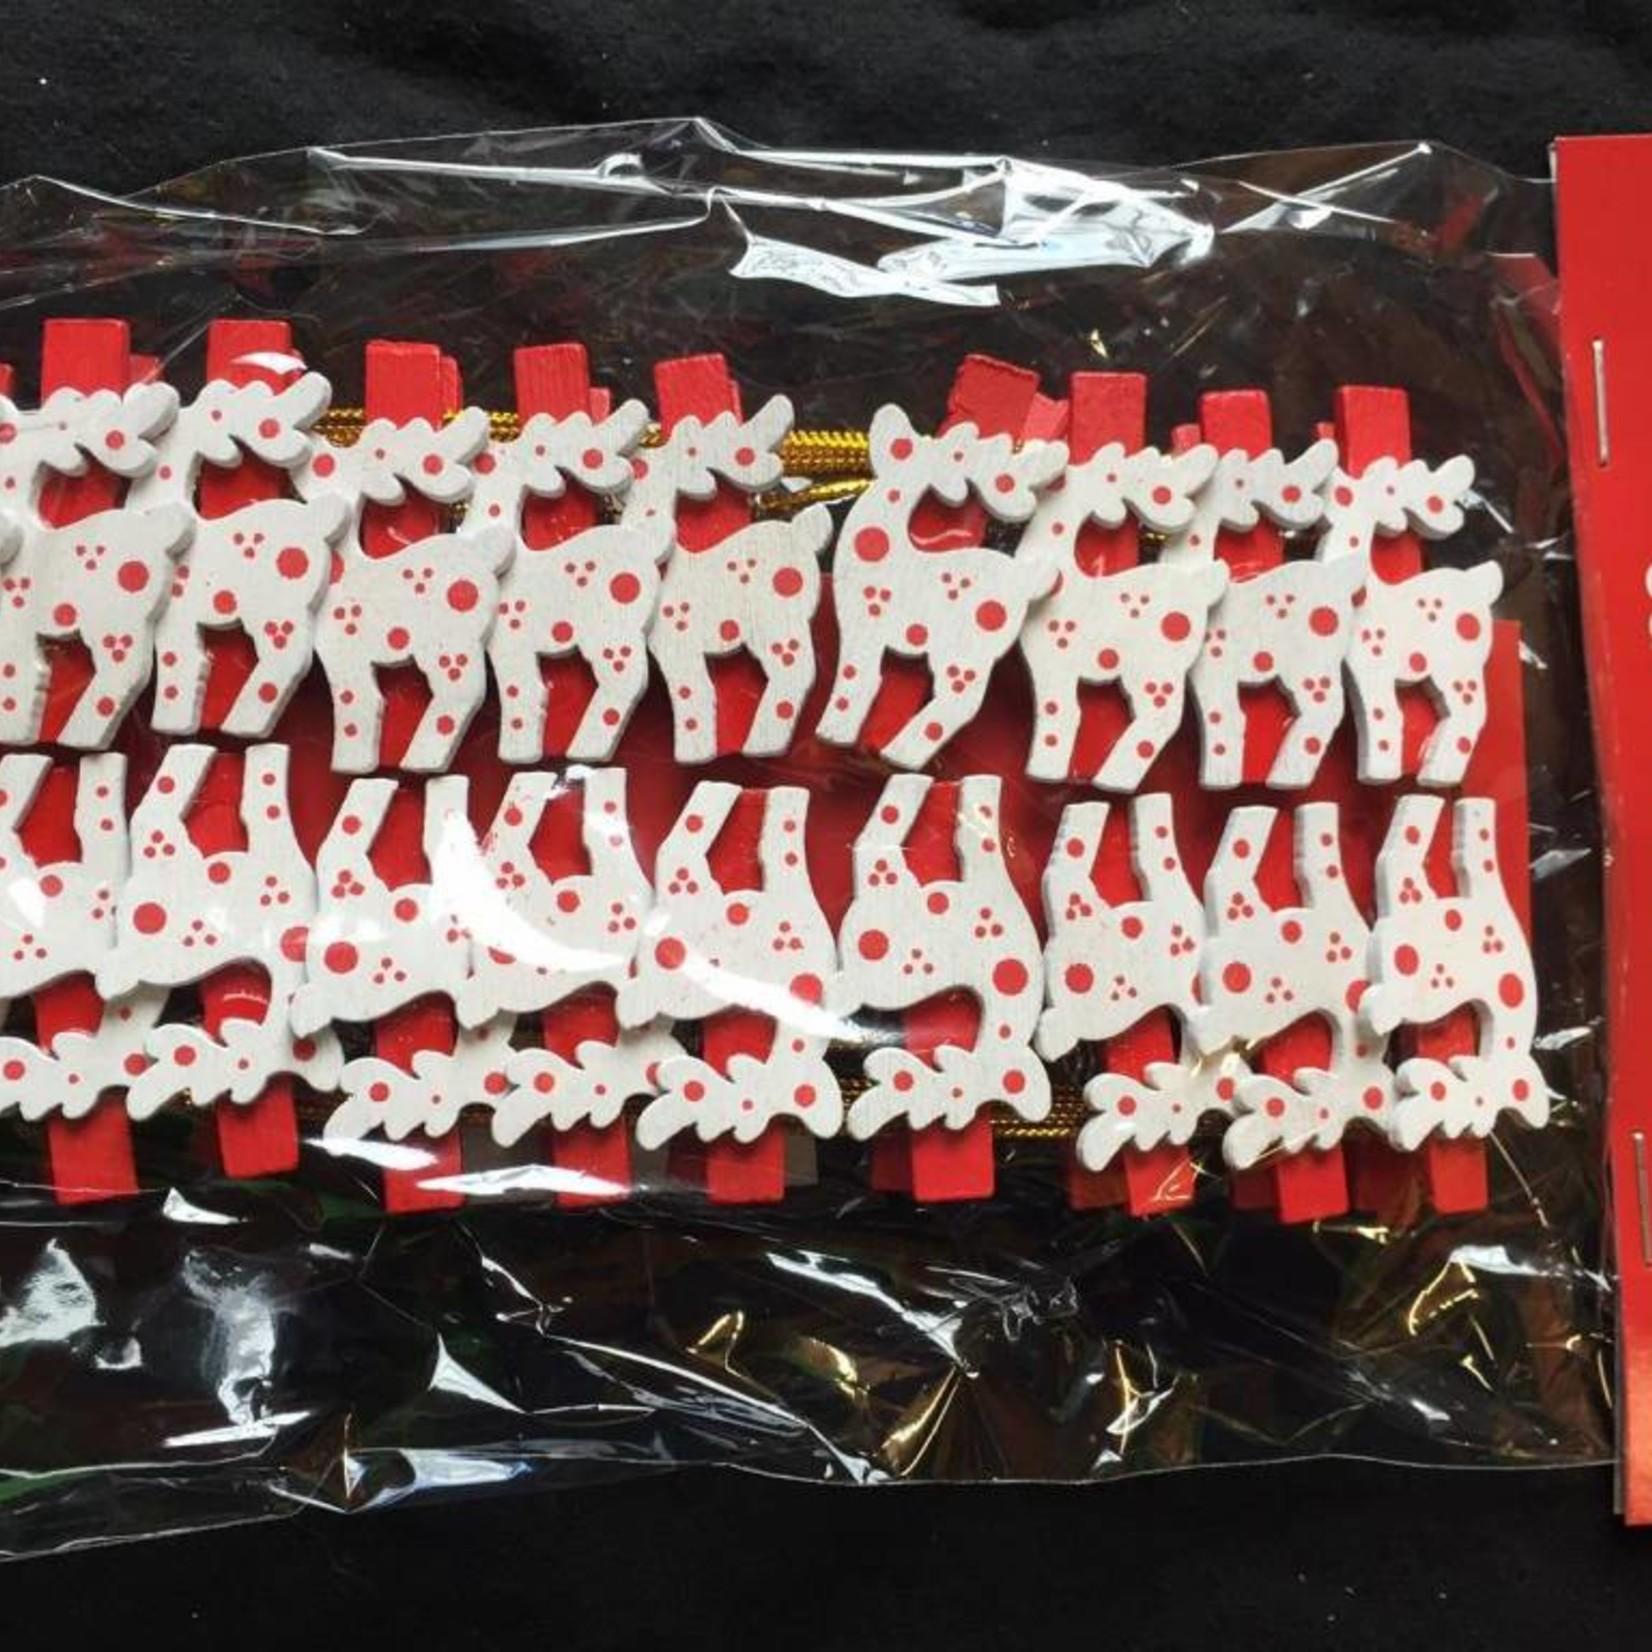 20pc Tree and Reindeer Peg Card Holders - Asst